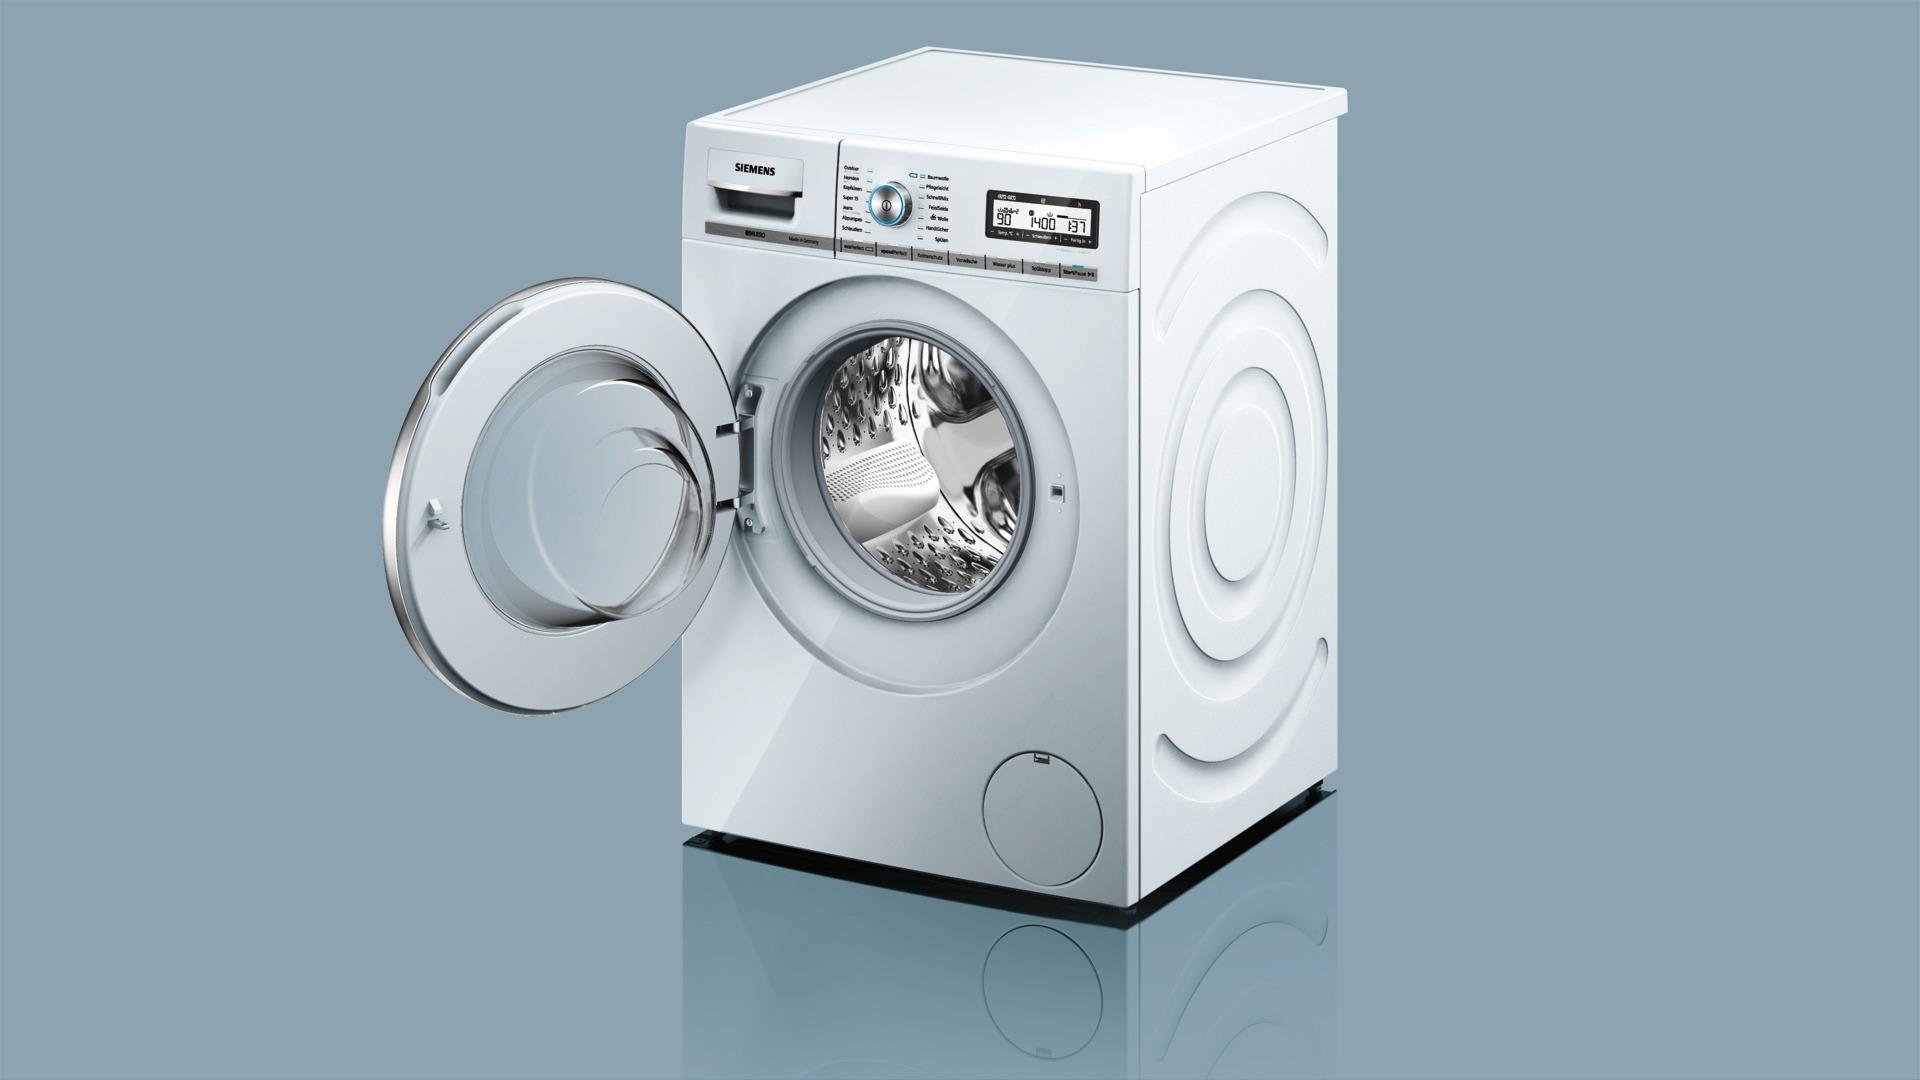 siemens extraklasse waschmaschine wm14y59d vs elektro. Black Bedroom Furniture Sets. Home Design Ideas